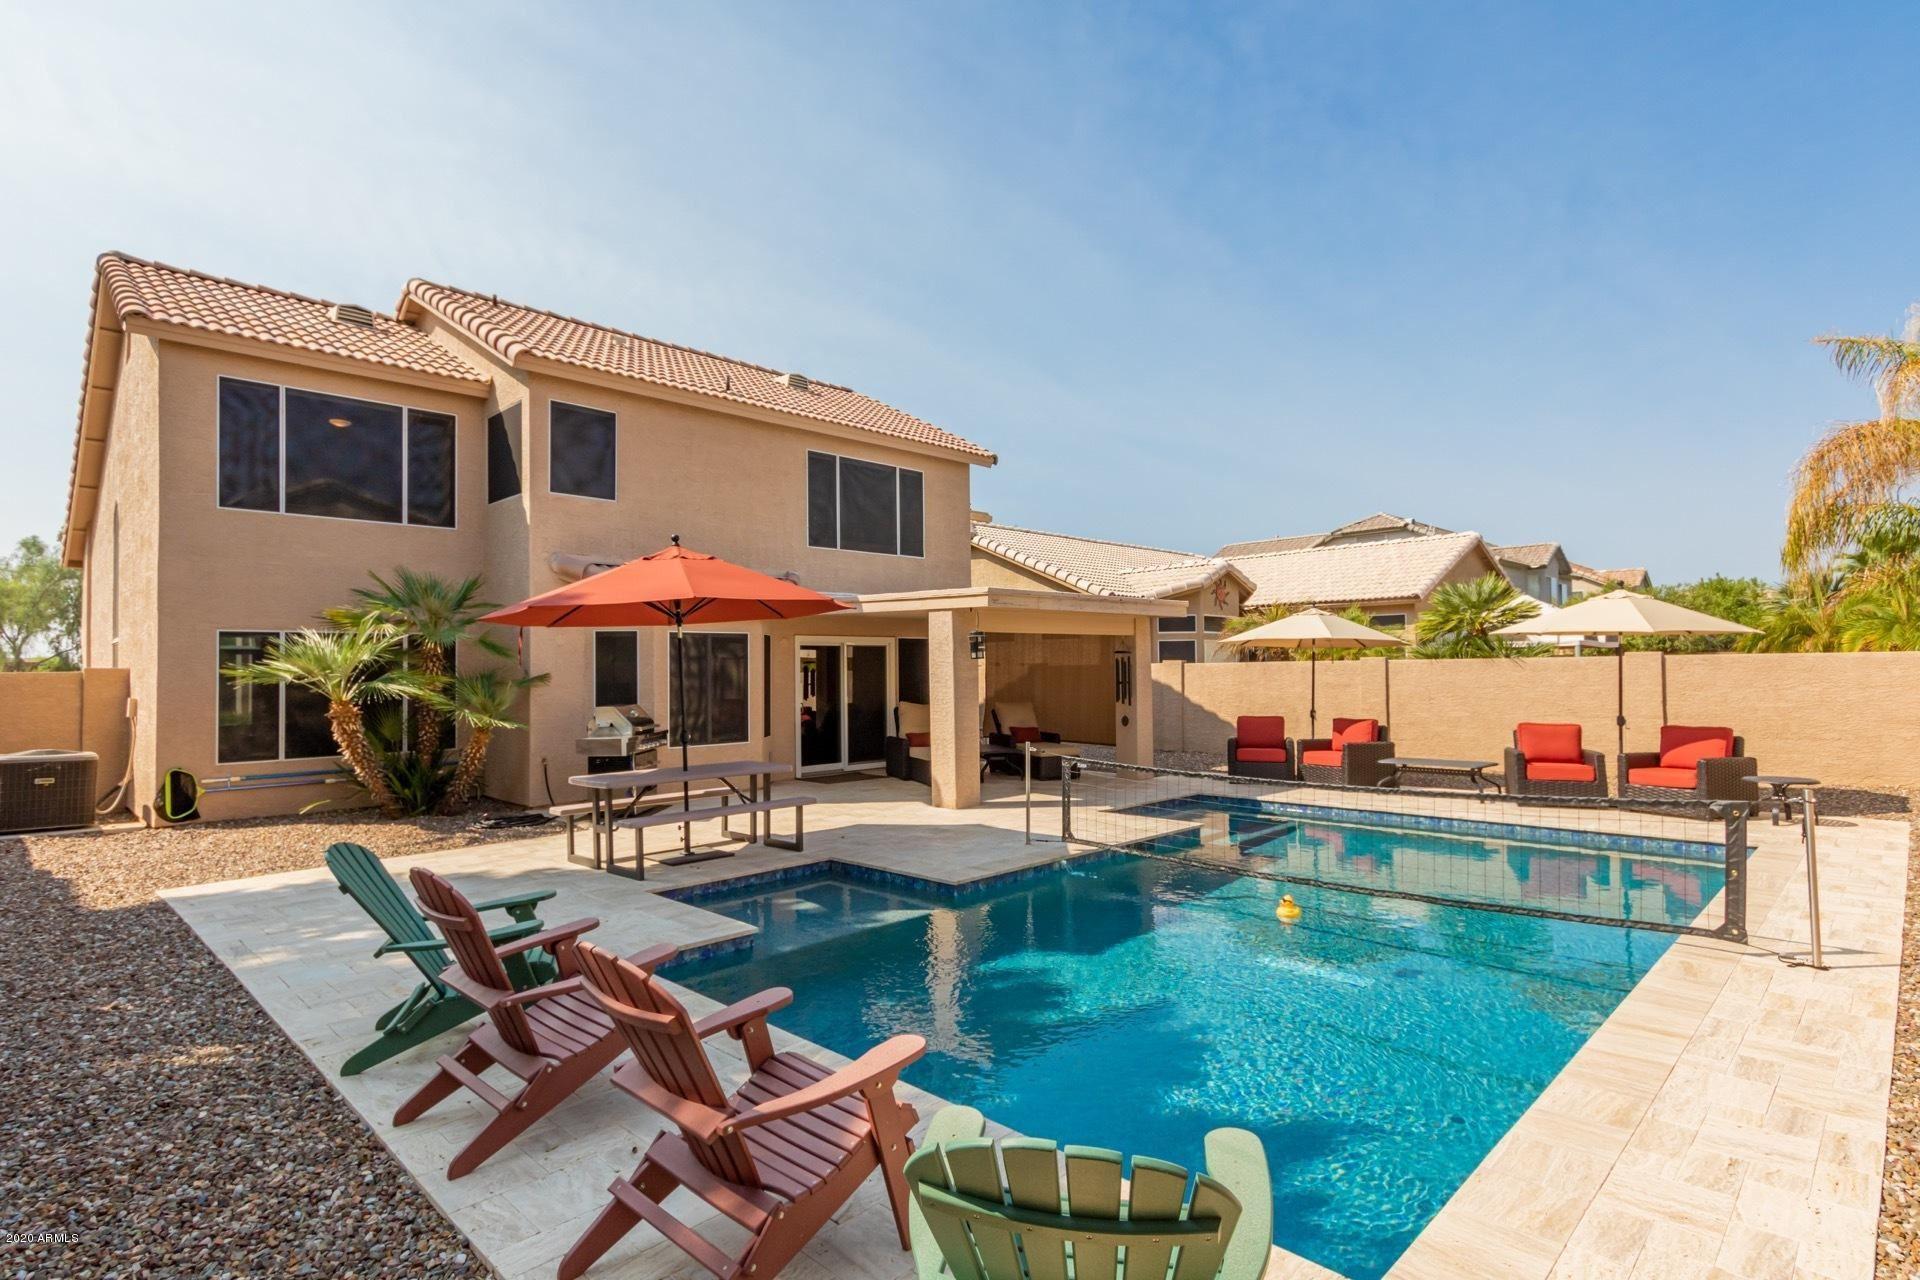 9360 E HILLERY Way, Scottsdale, AZ 85260 - MLS#: 6133158